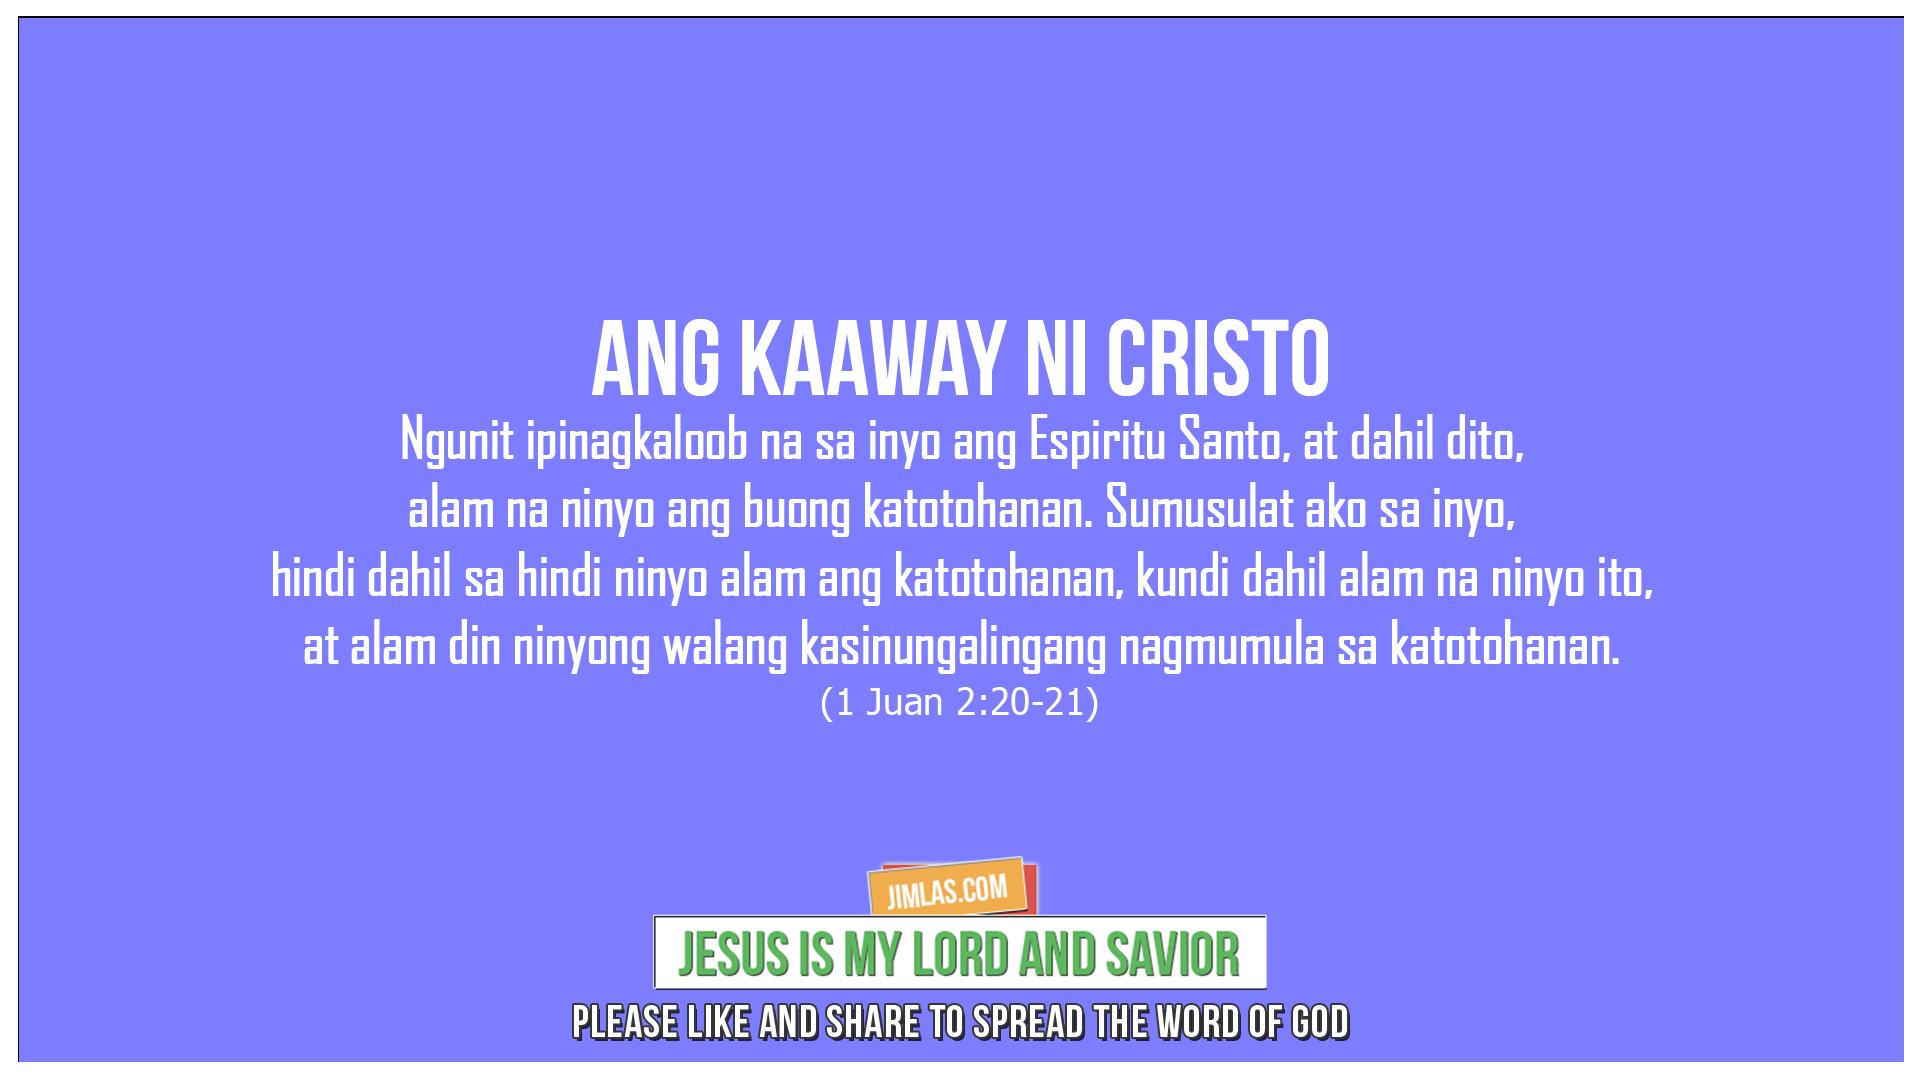 1 Juan 2:20-21, 1 Juan 2:20-21